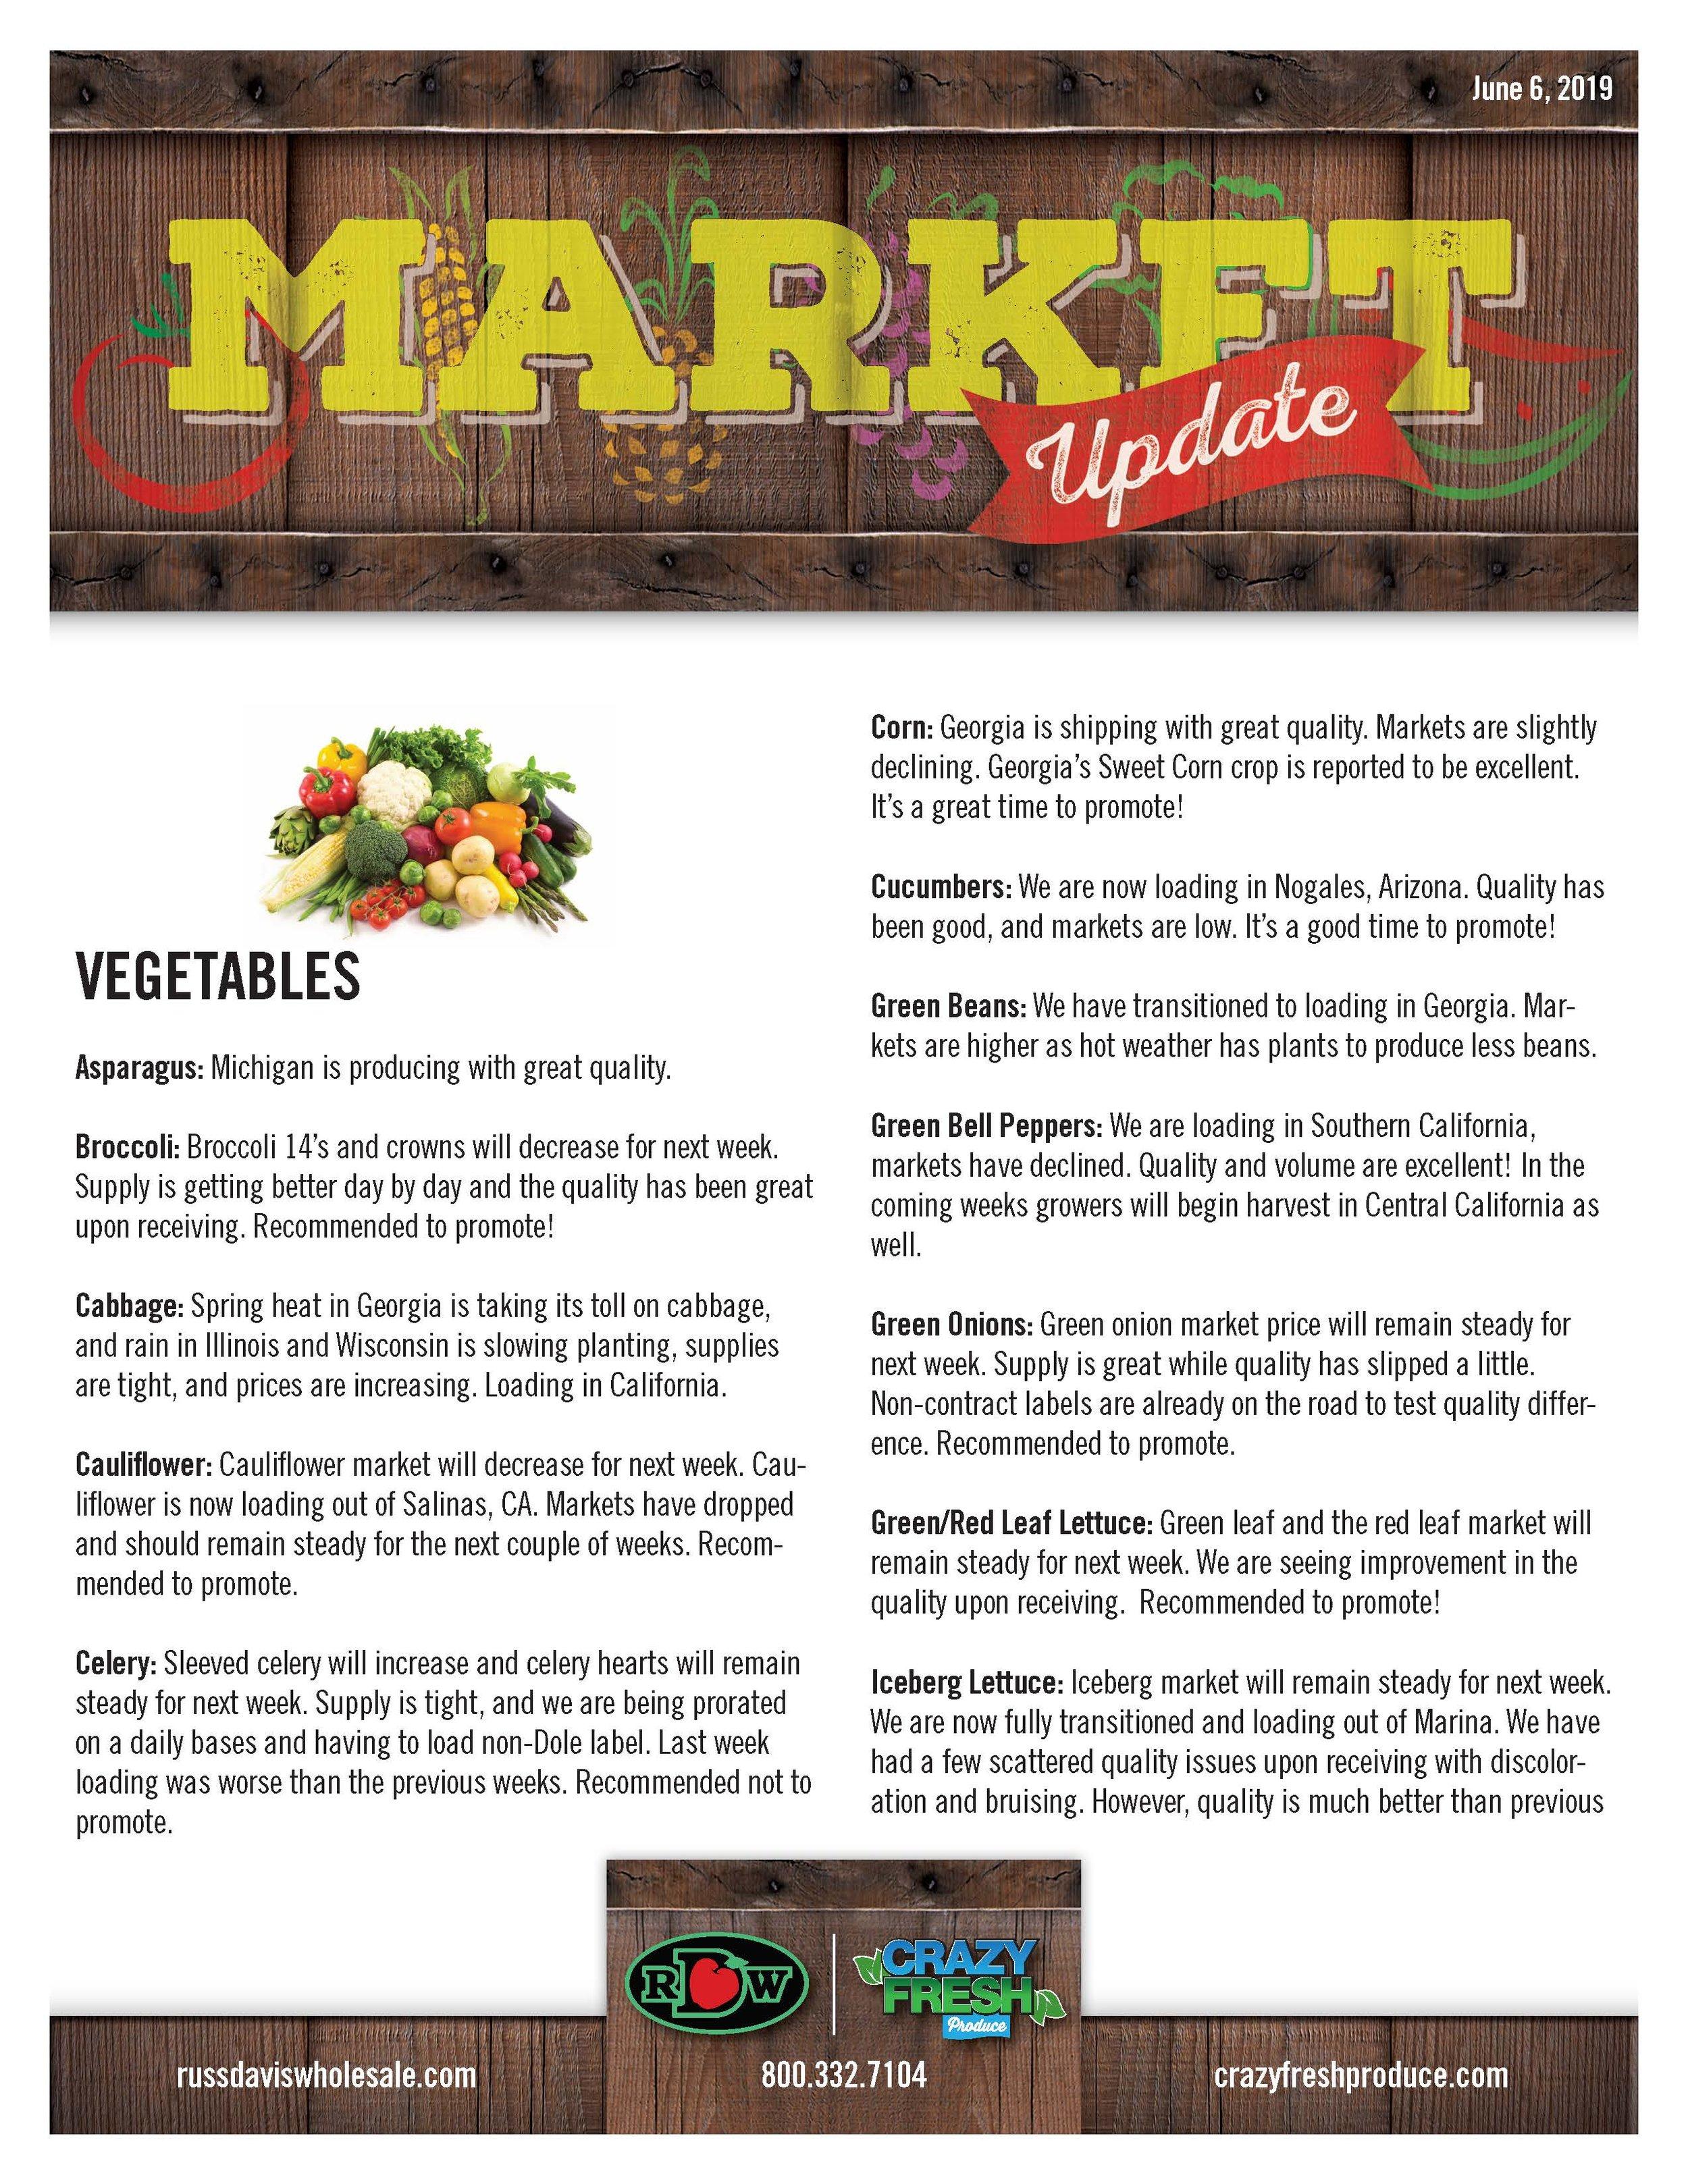 RDW_Market_Update_June6_19_Page_1.jpg